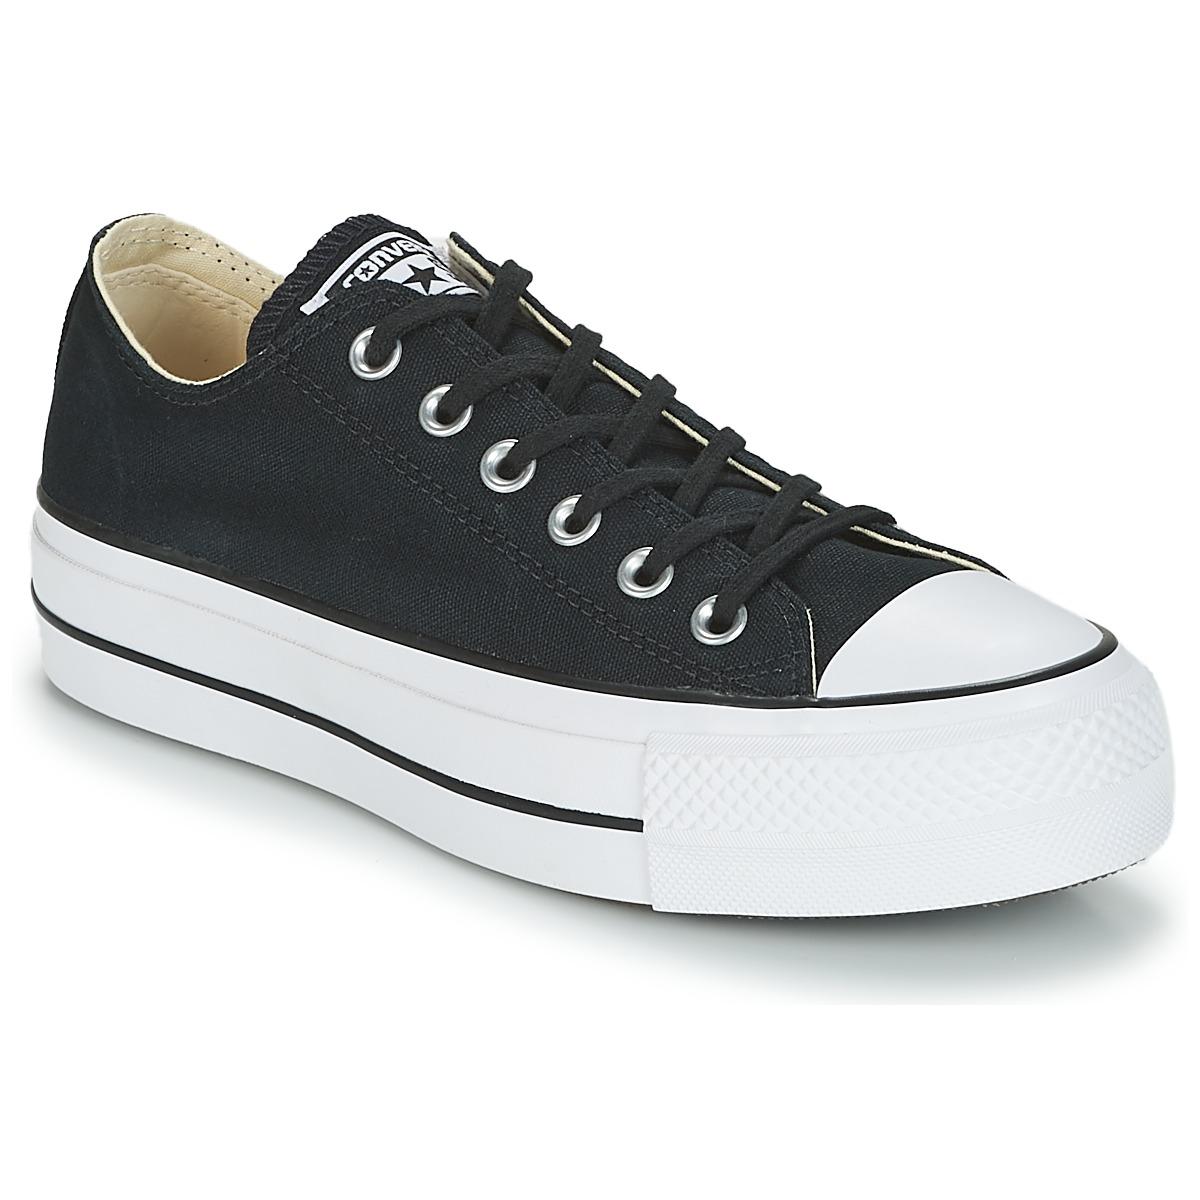 e0a71e634fb9ea Converse Chuck Taylor All Star Lift Clean Ox Core Canvas Schwarz -  Kostenloser Versand bei Spartoode ! - Schuhe Sneaker Low Damen 63